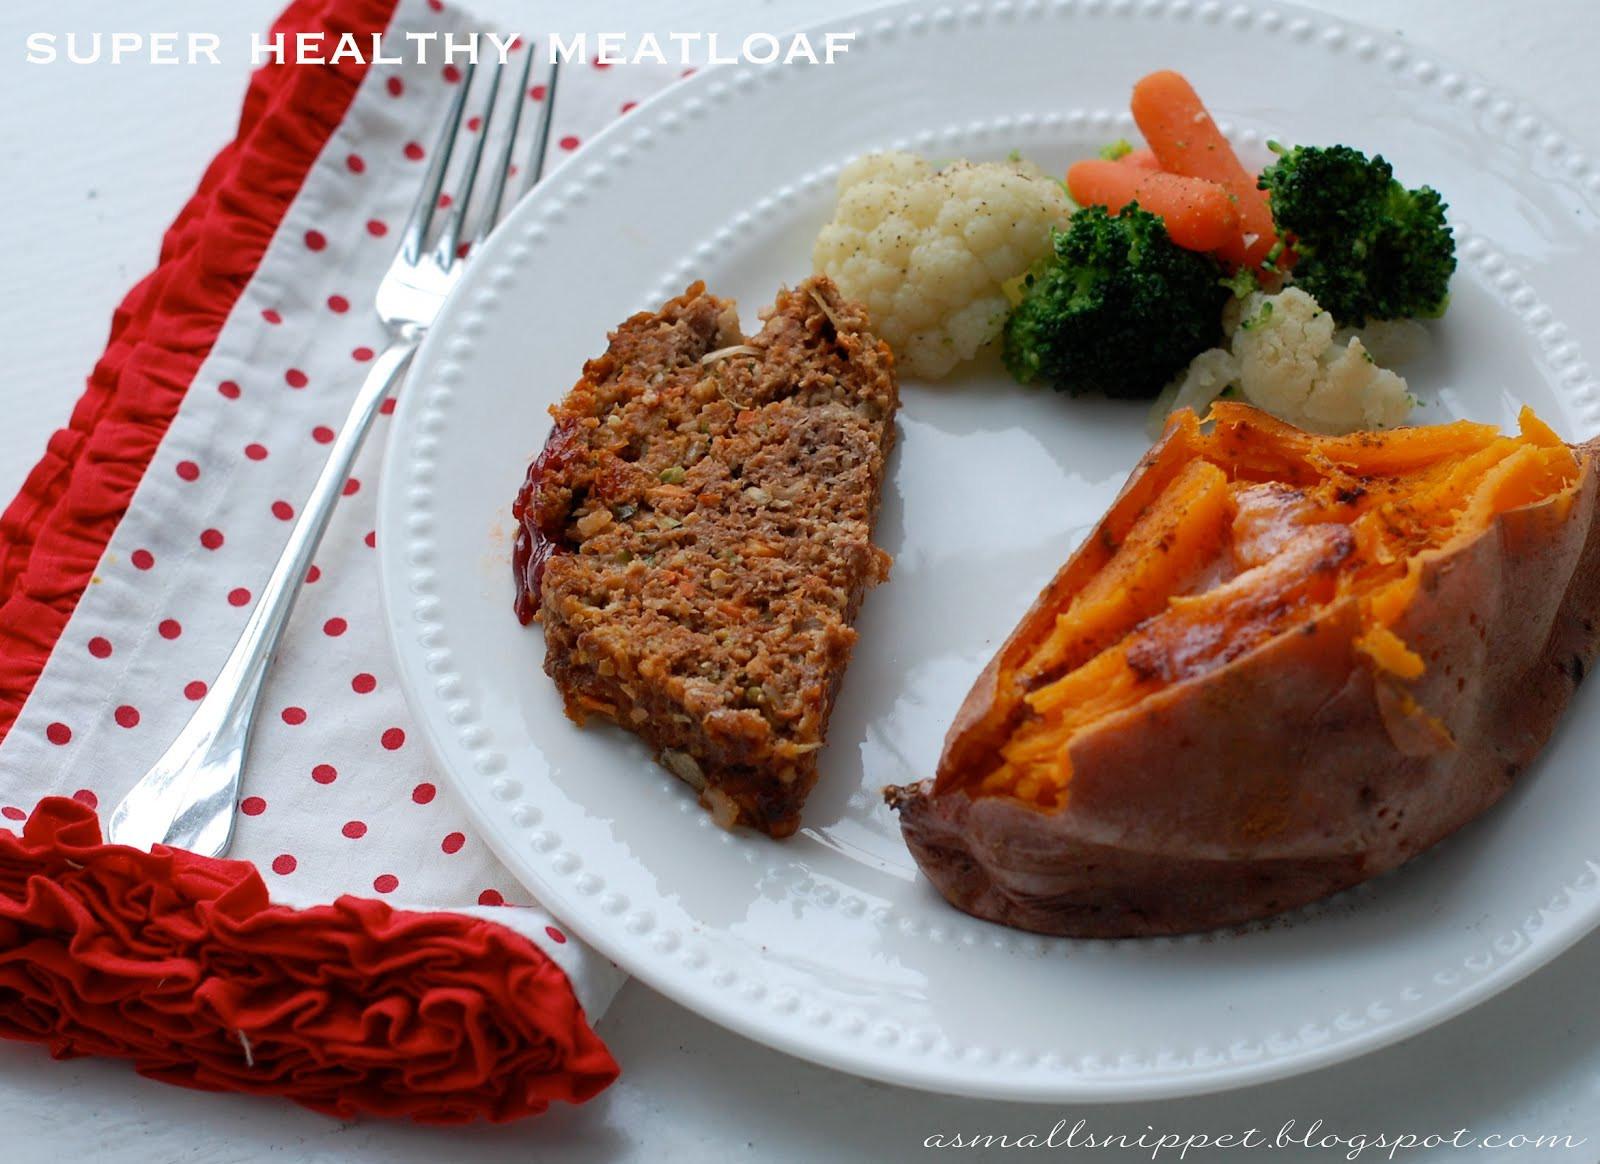 Meatloaf Recipe Healthy  Super Healthy Meatloaf Recipe